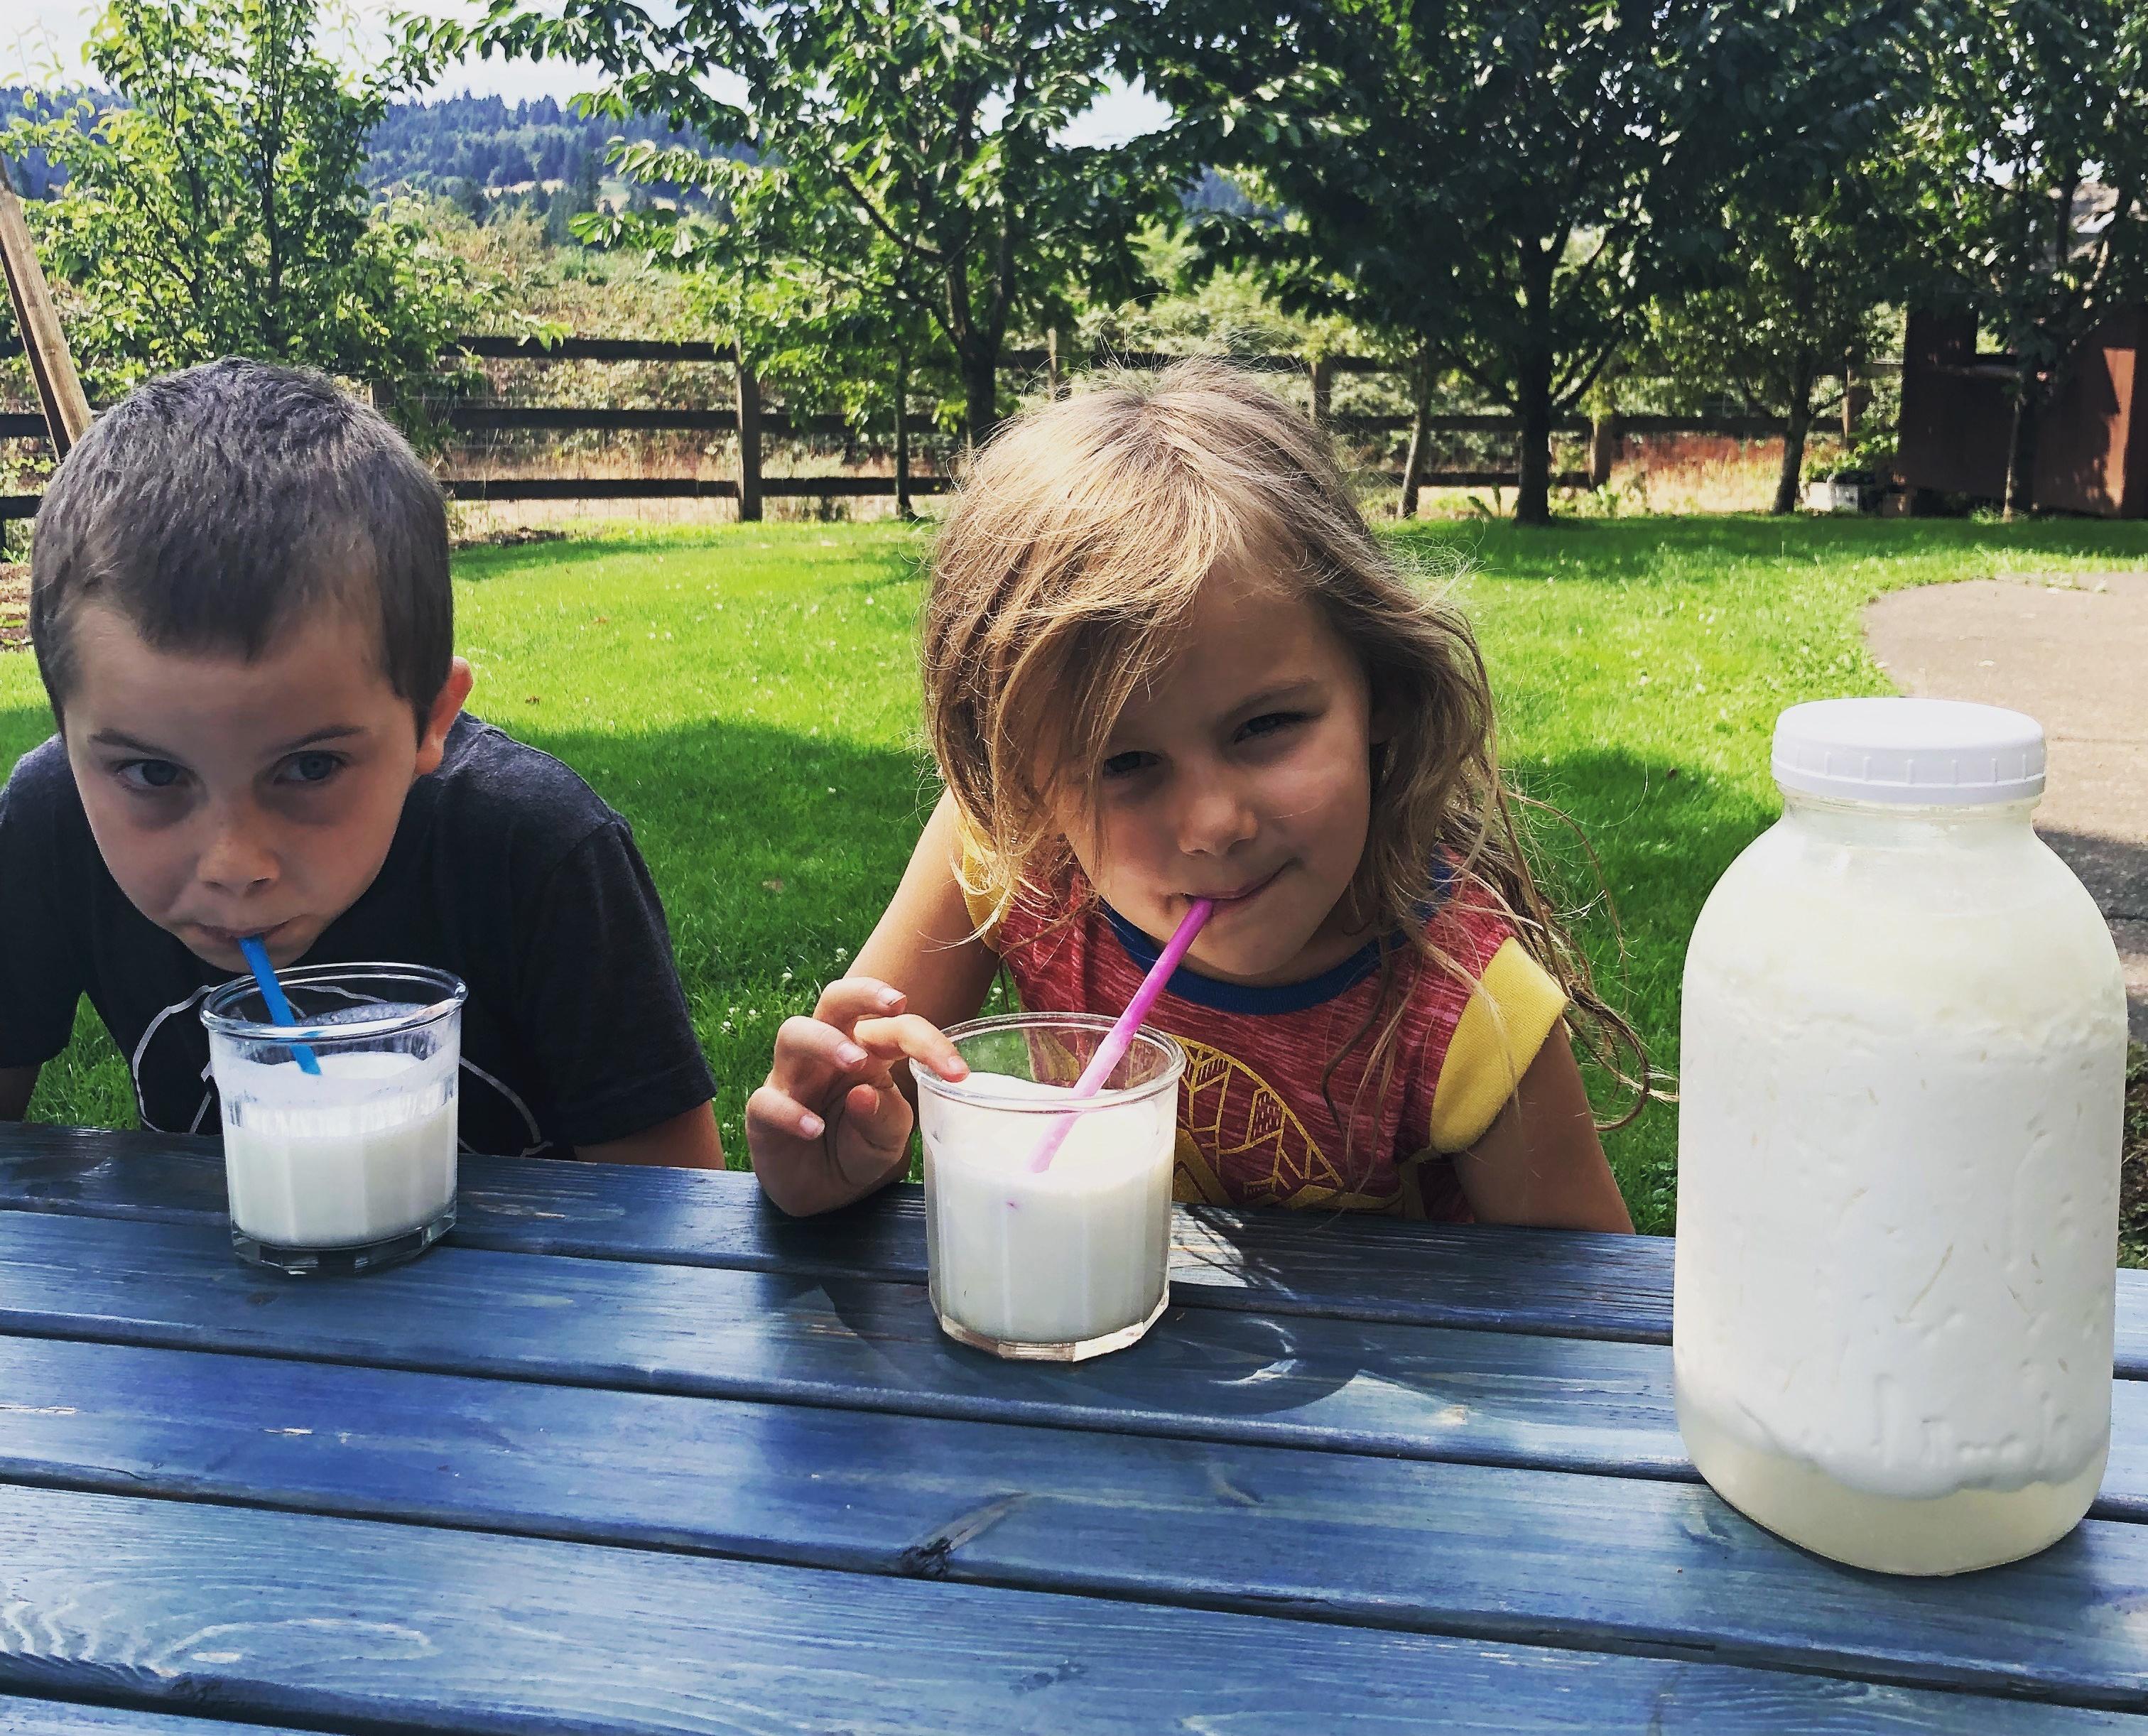 Kefir Grains for Milk, Coconut Milk and More